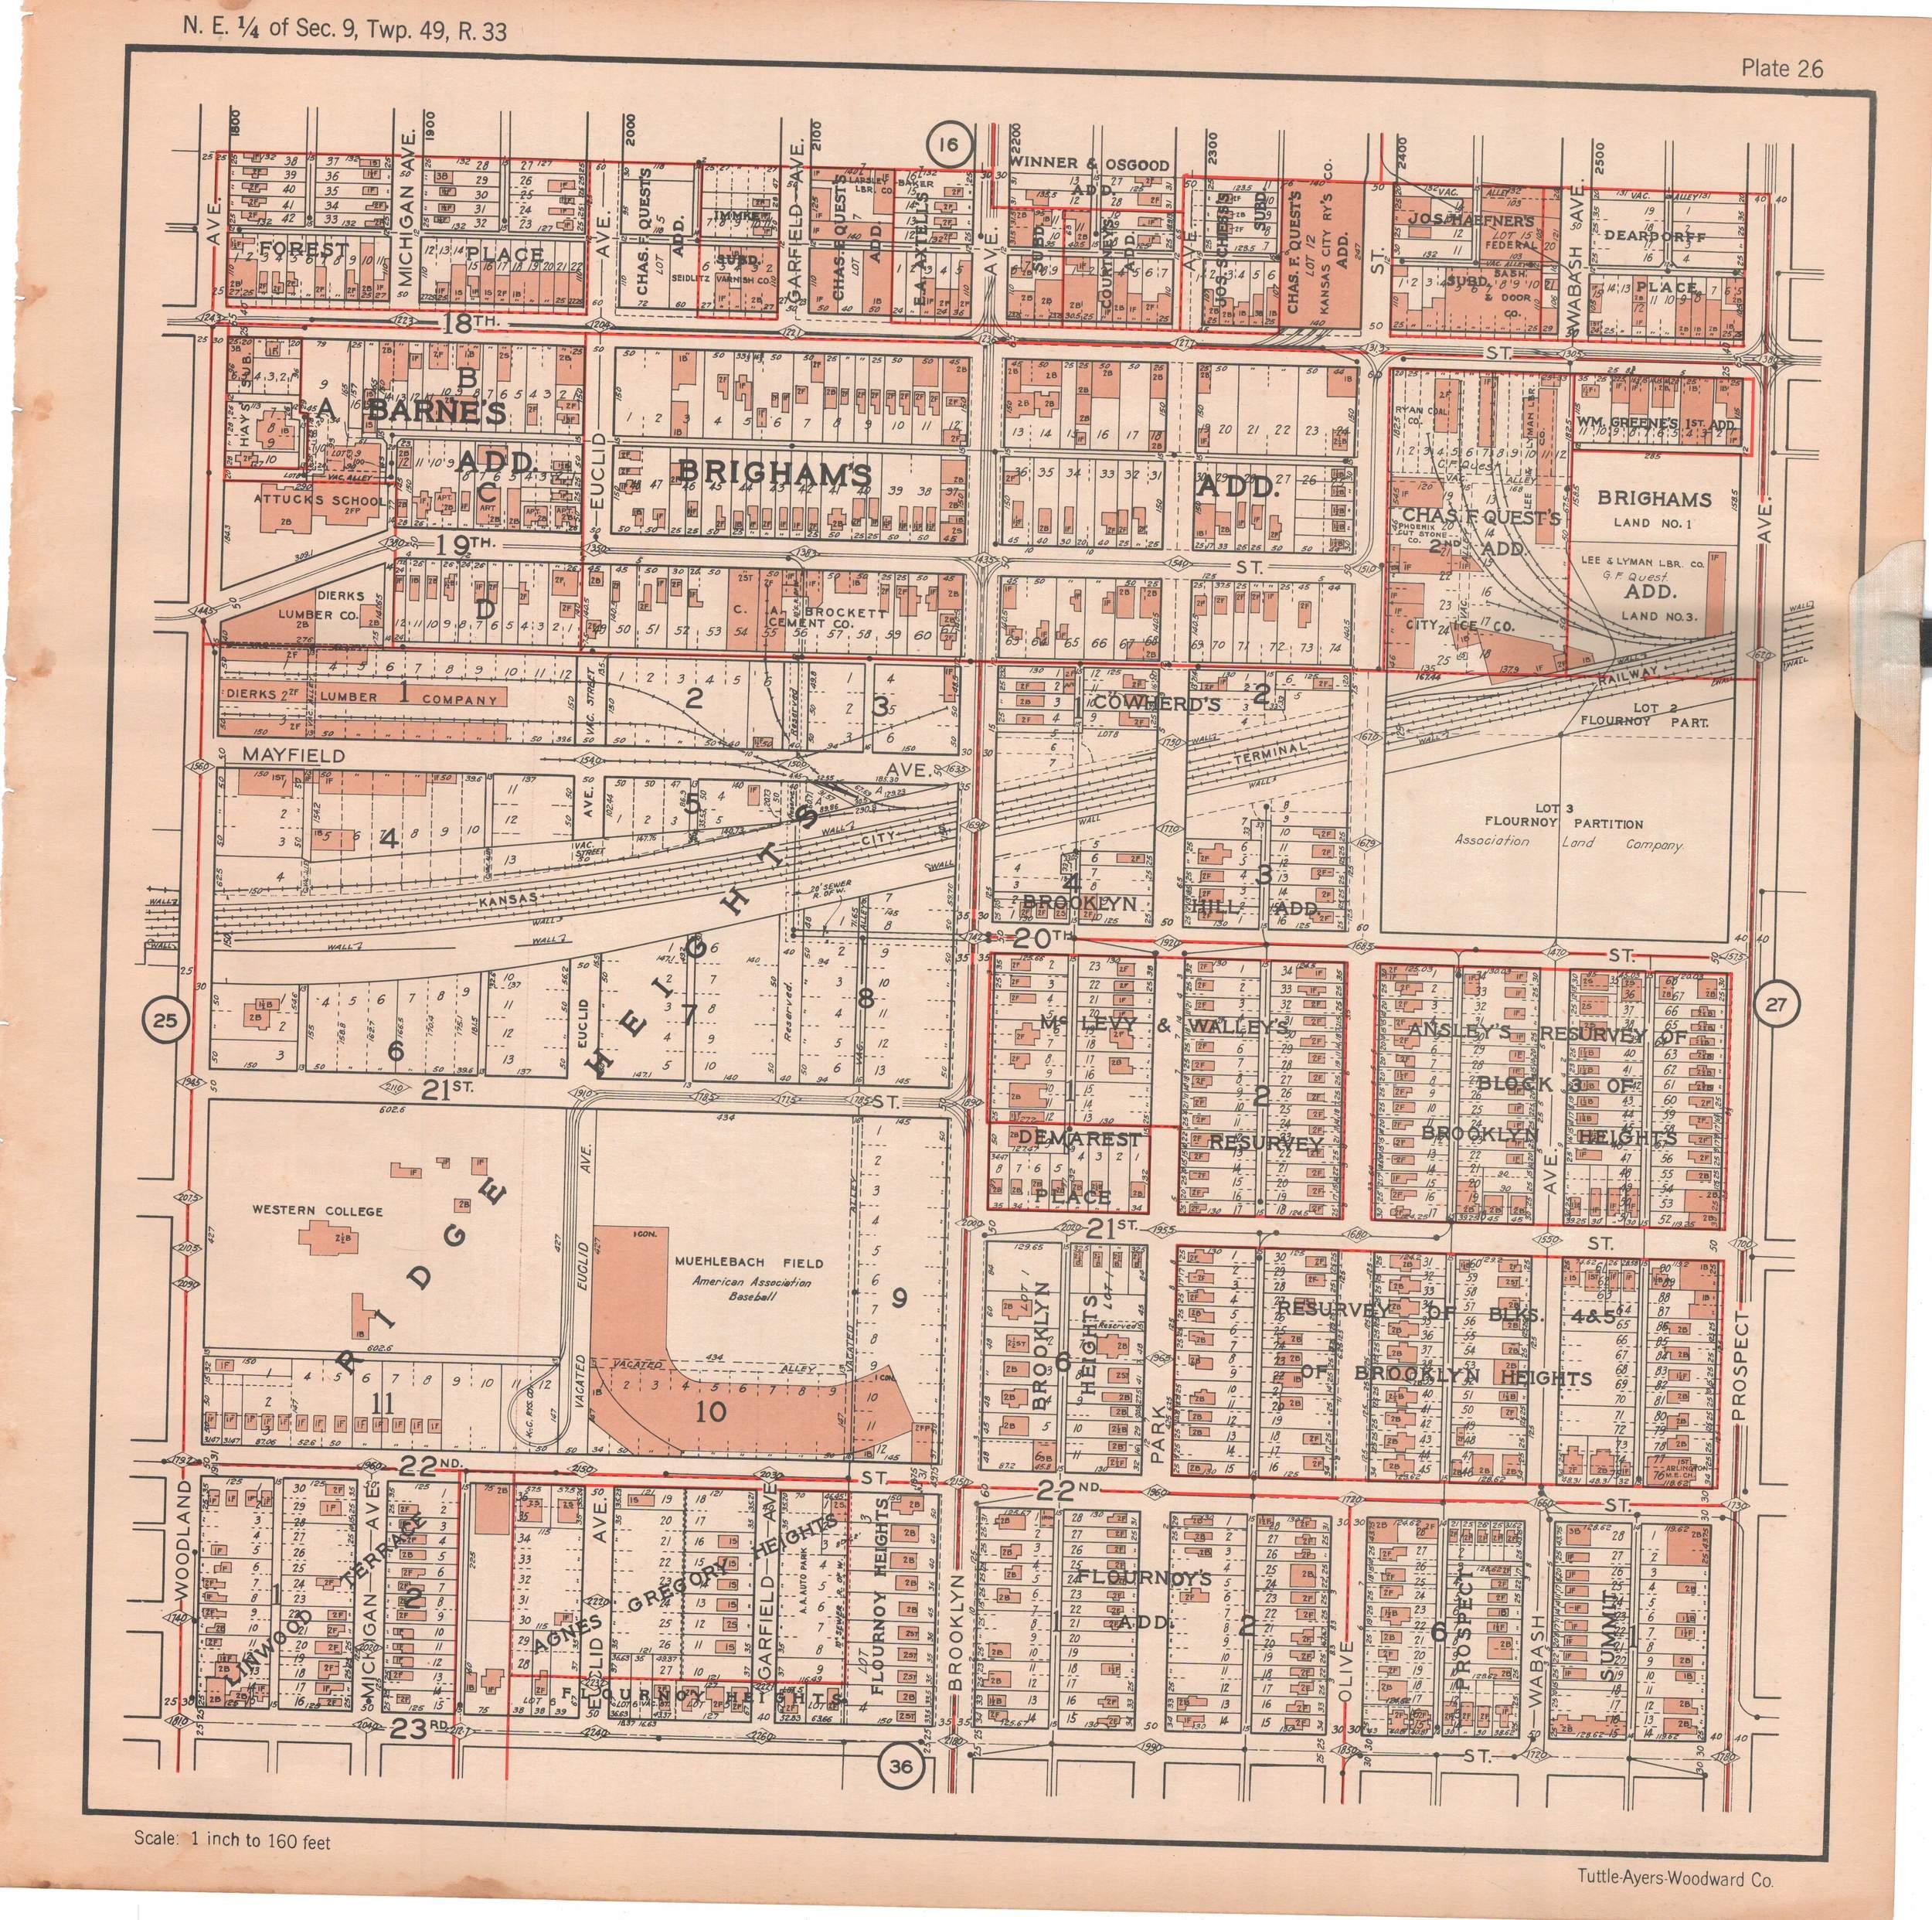 1925 TUTTLE_AYERS_Plate 26.JPG